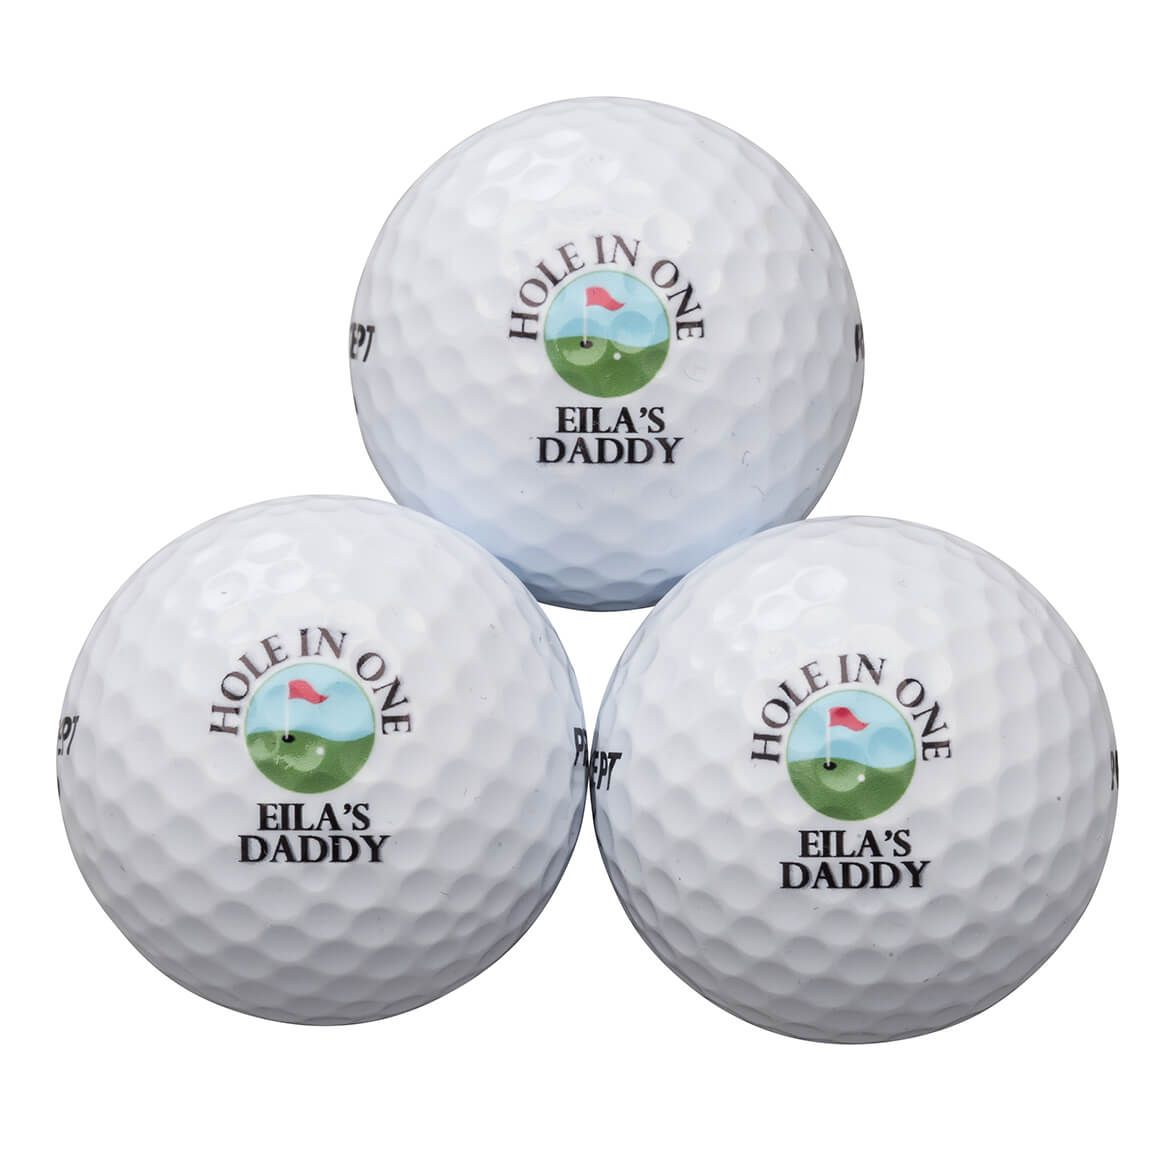 Personalized Precept® 3 Golf Balls Sleeve-365573